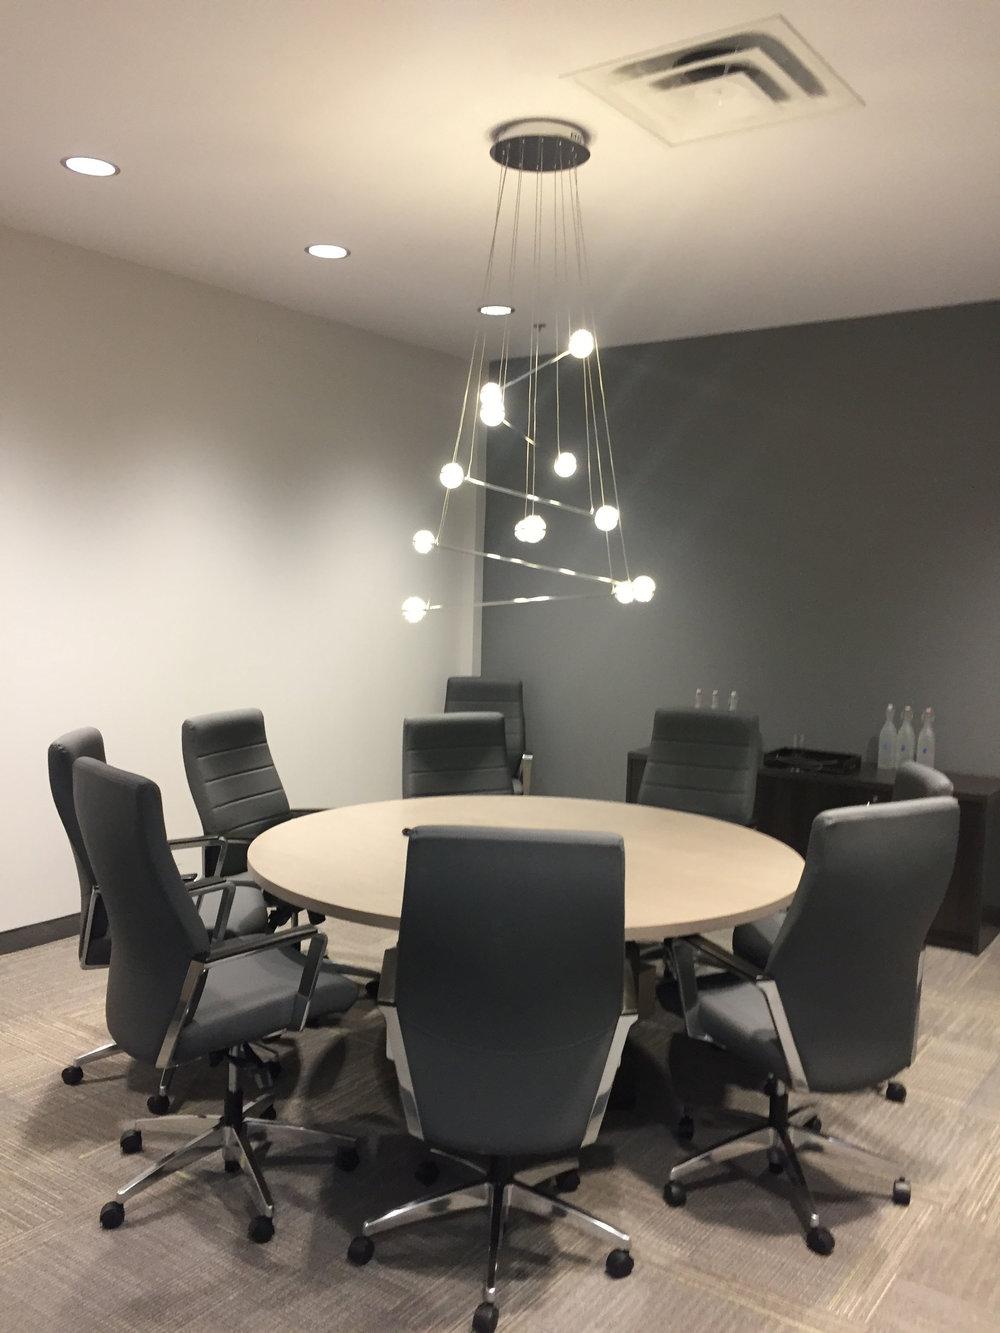 Office lights Low.jpg